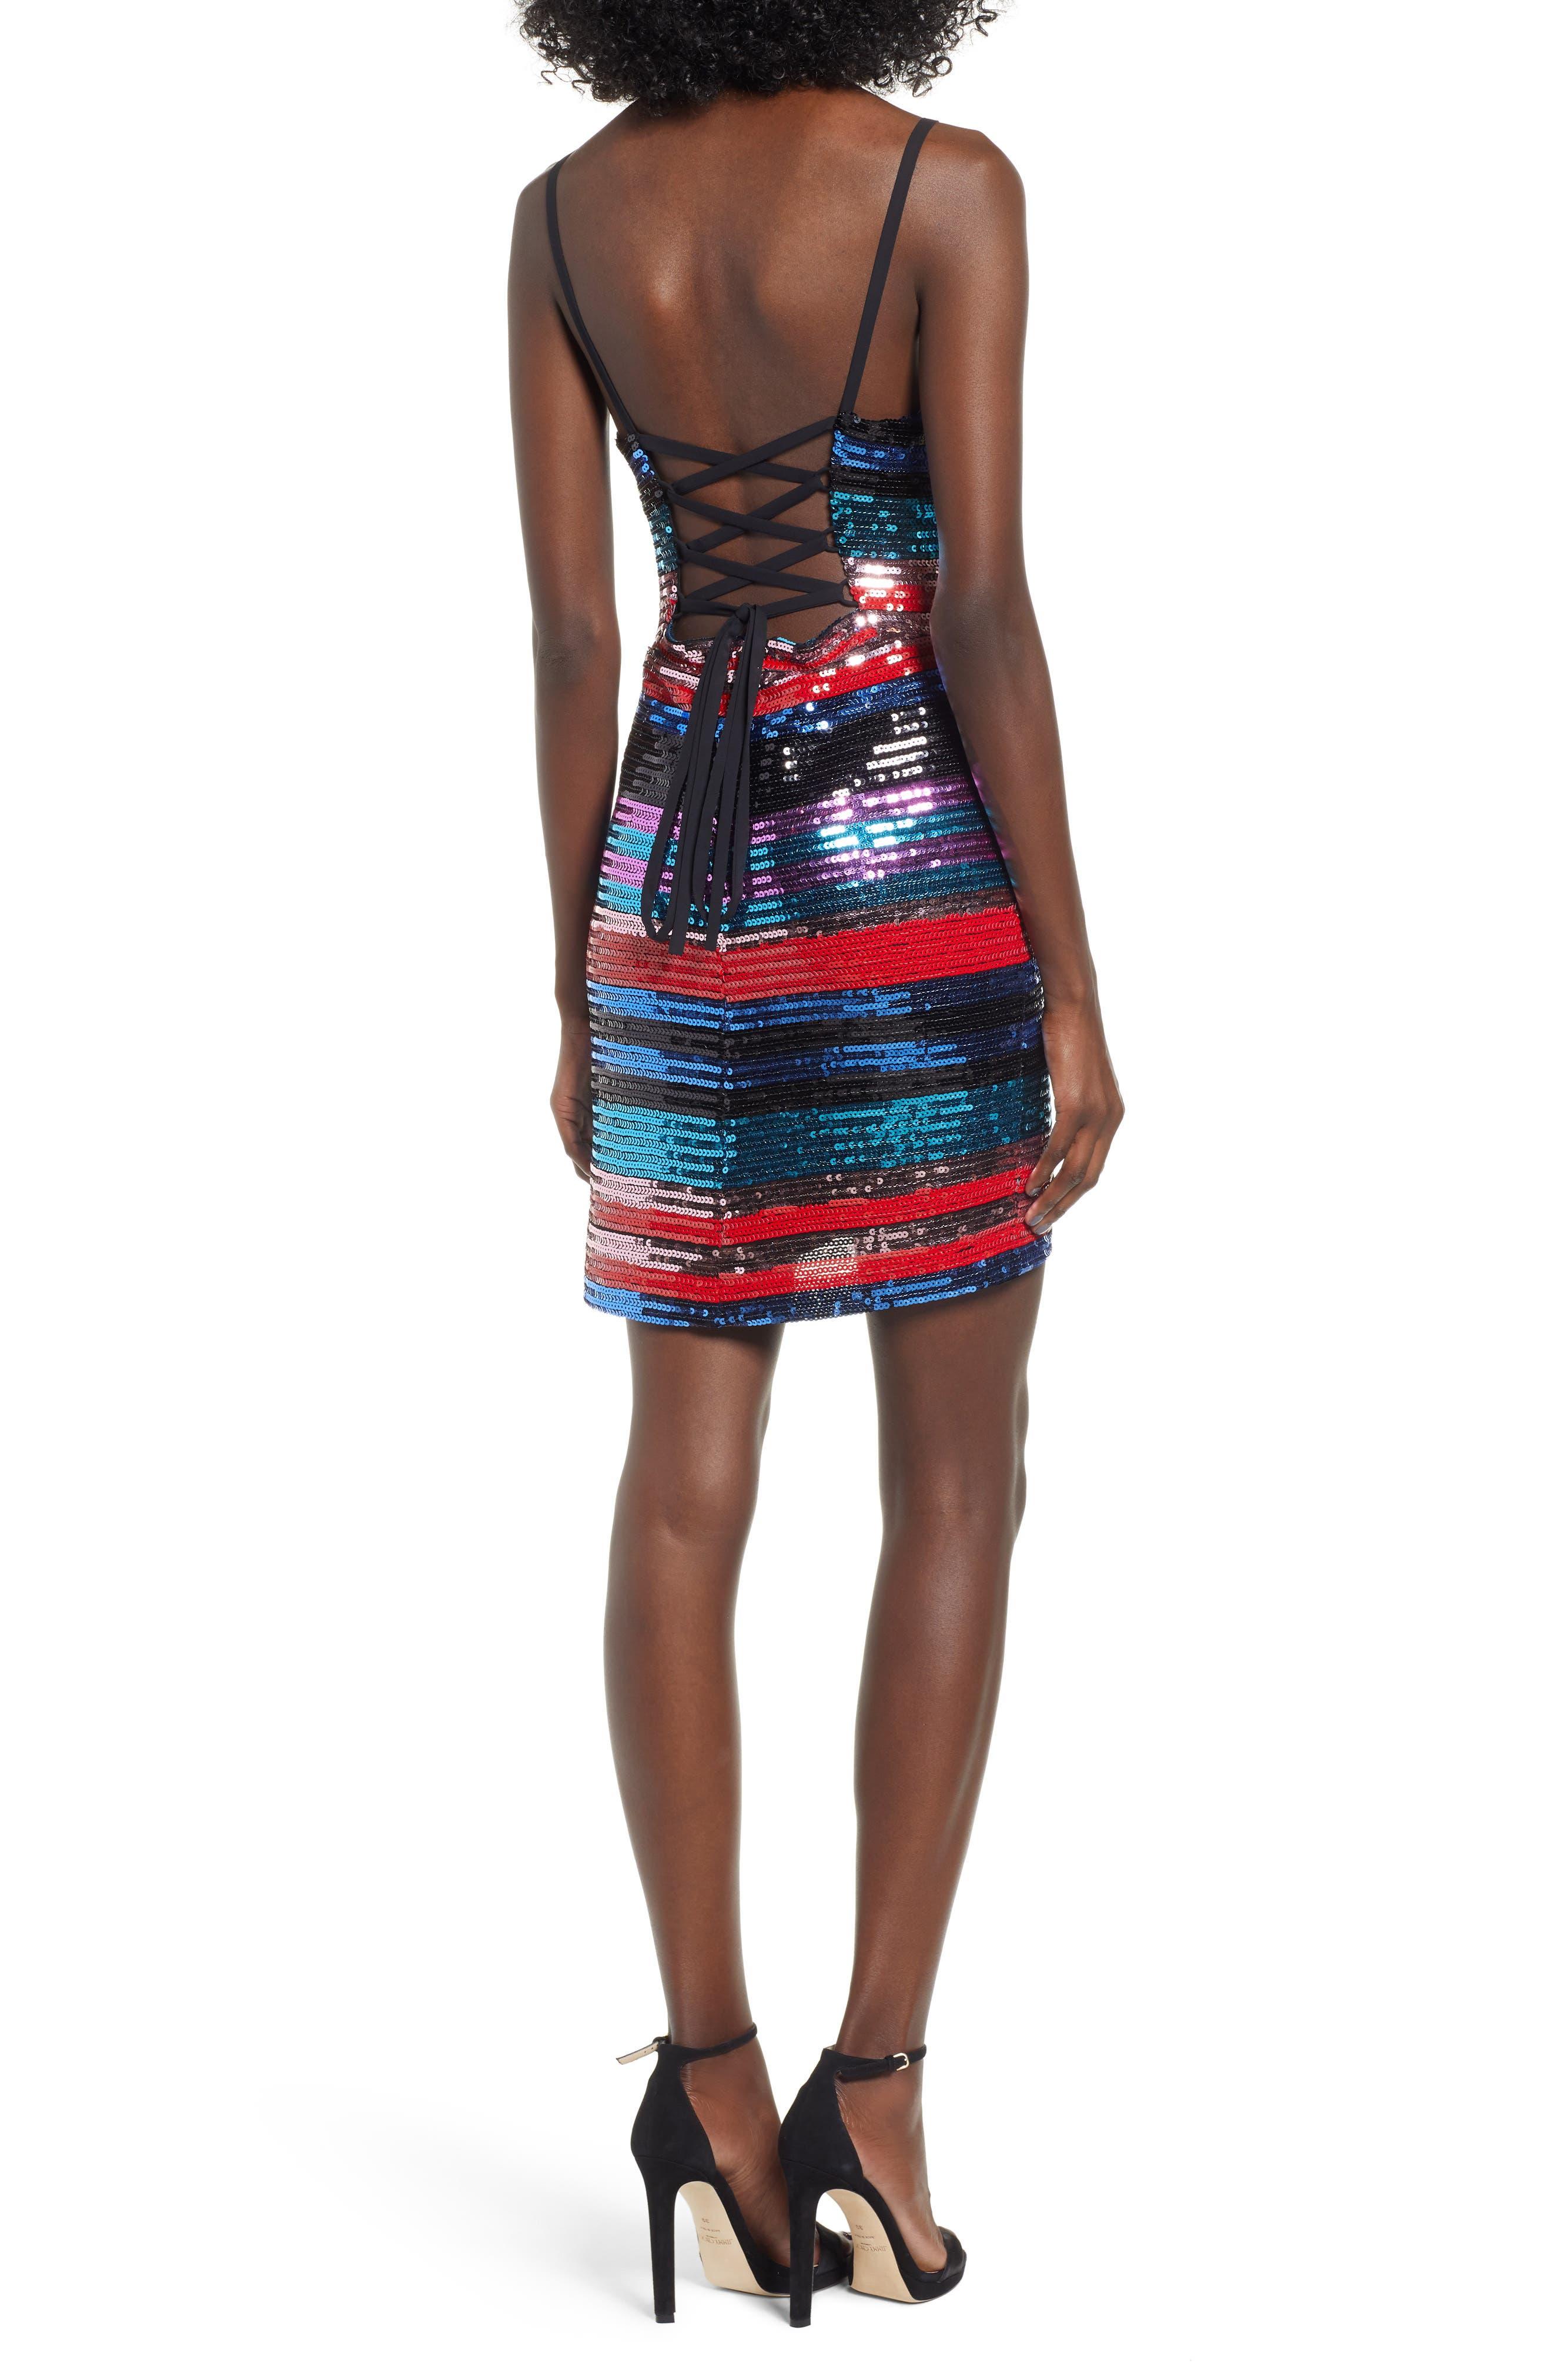 Manfi Lace-Up Back Sequin Stripe Minidress,                             Alternate thumbnail 2, color,                             RED SEQUIN STRIPE